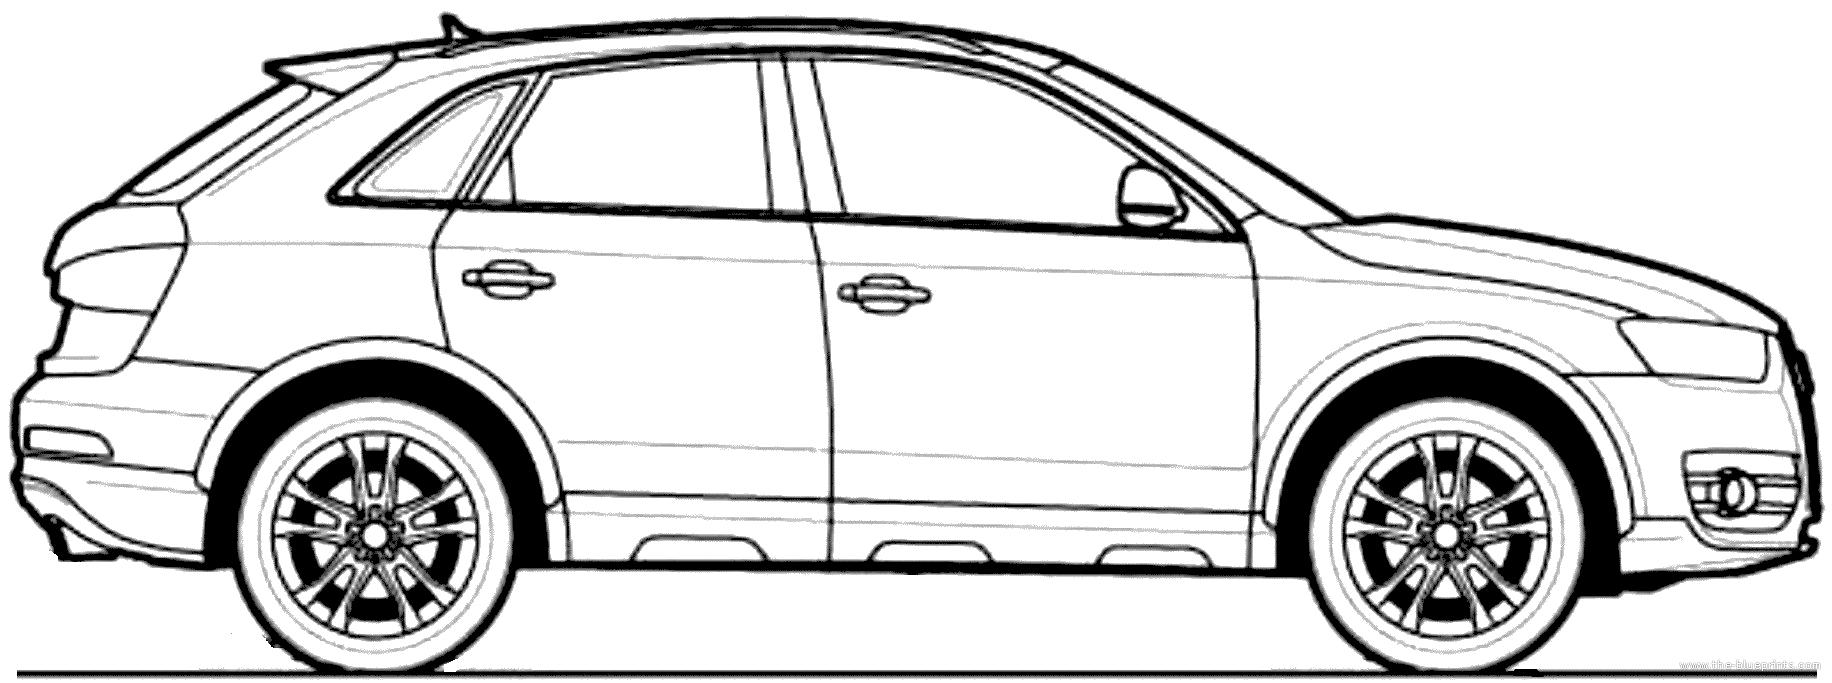 Blueprints > Cars > Audi > Audi Q3 (2012)